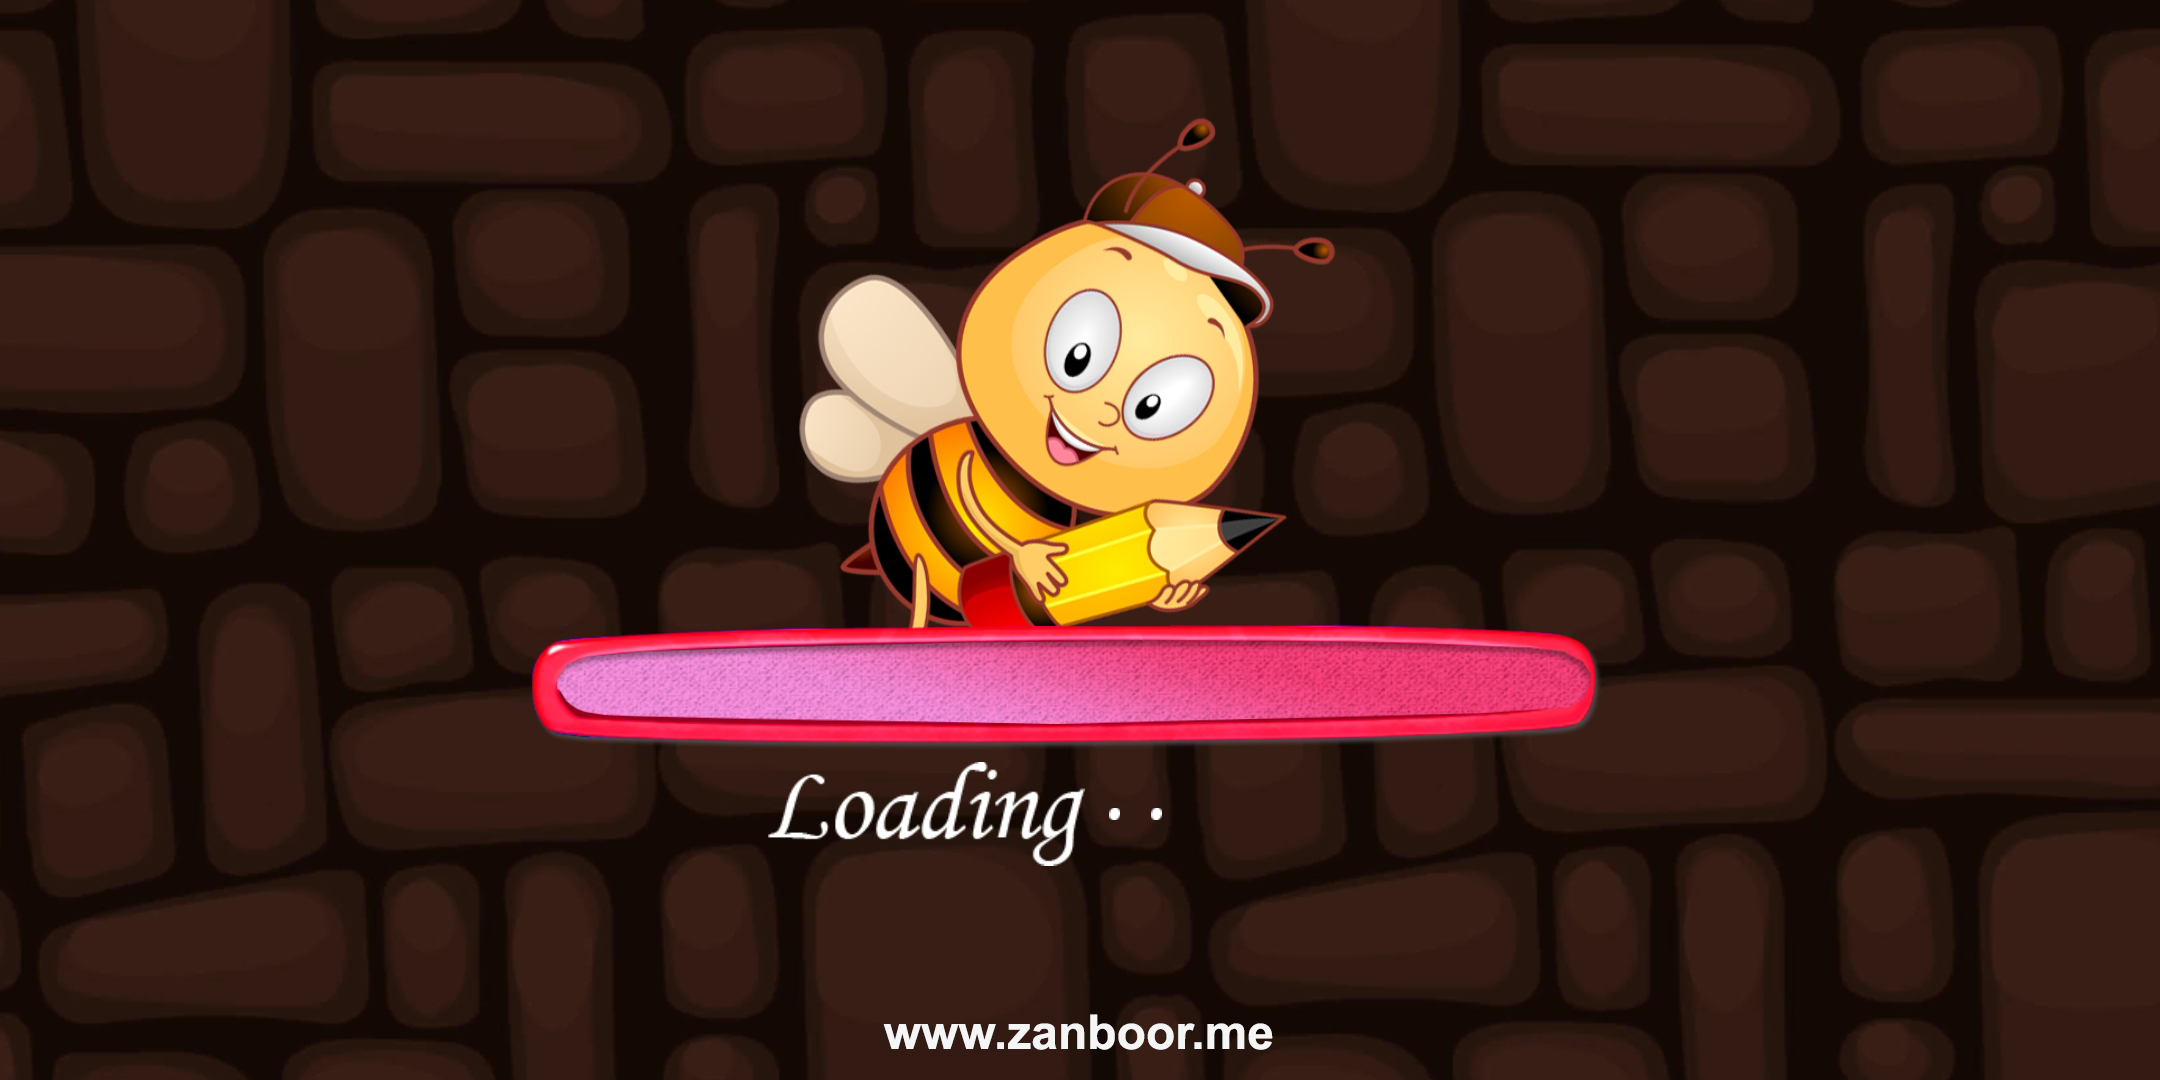 اپلیکیشن زنبور